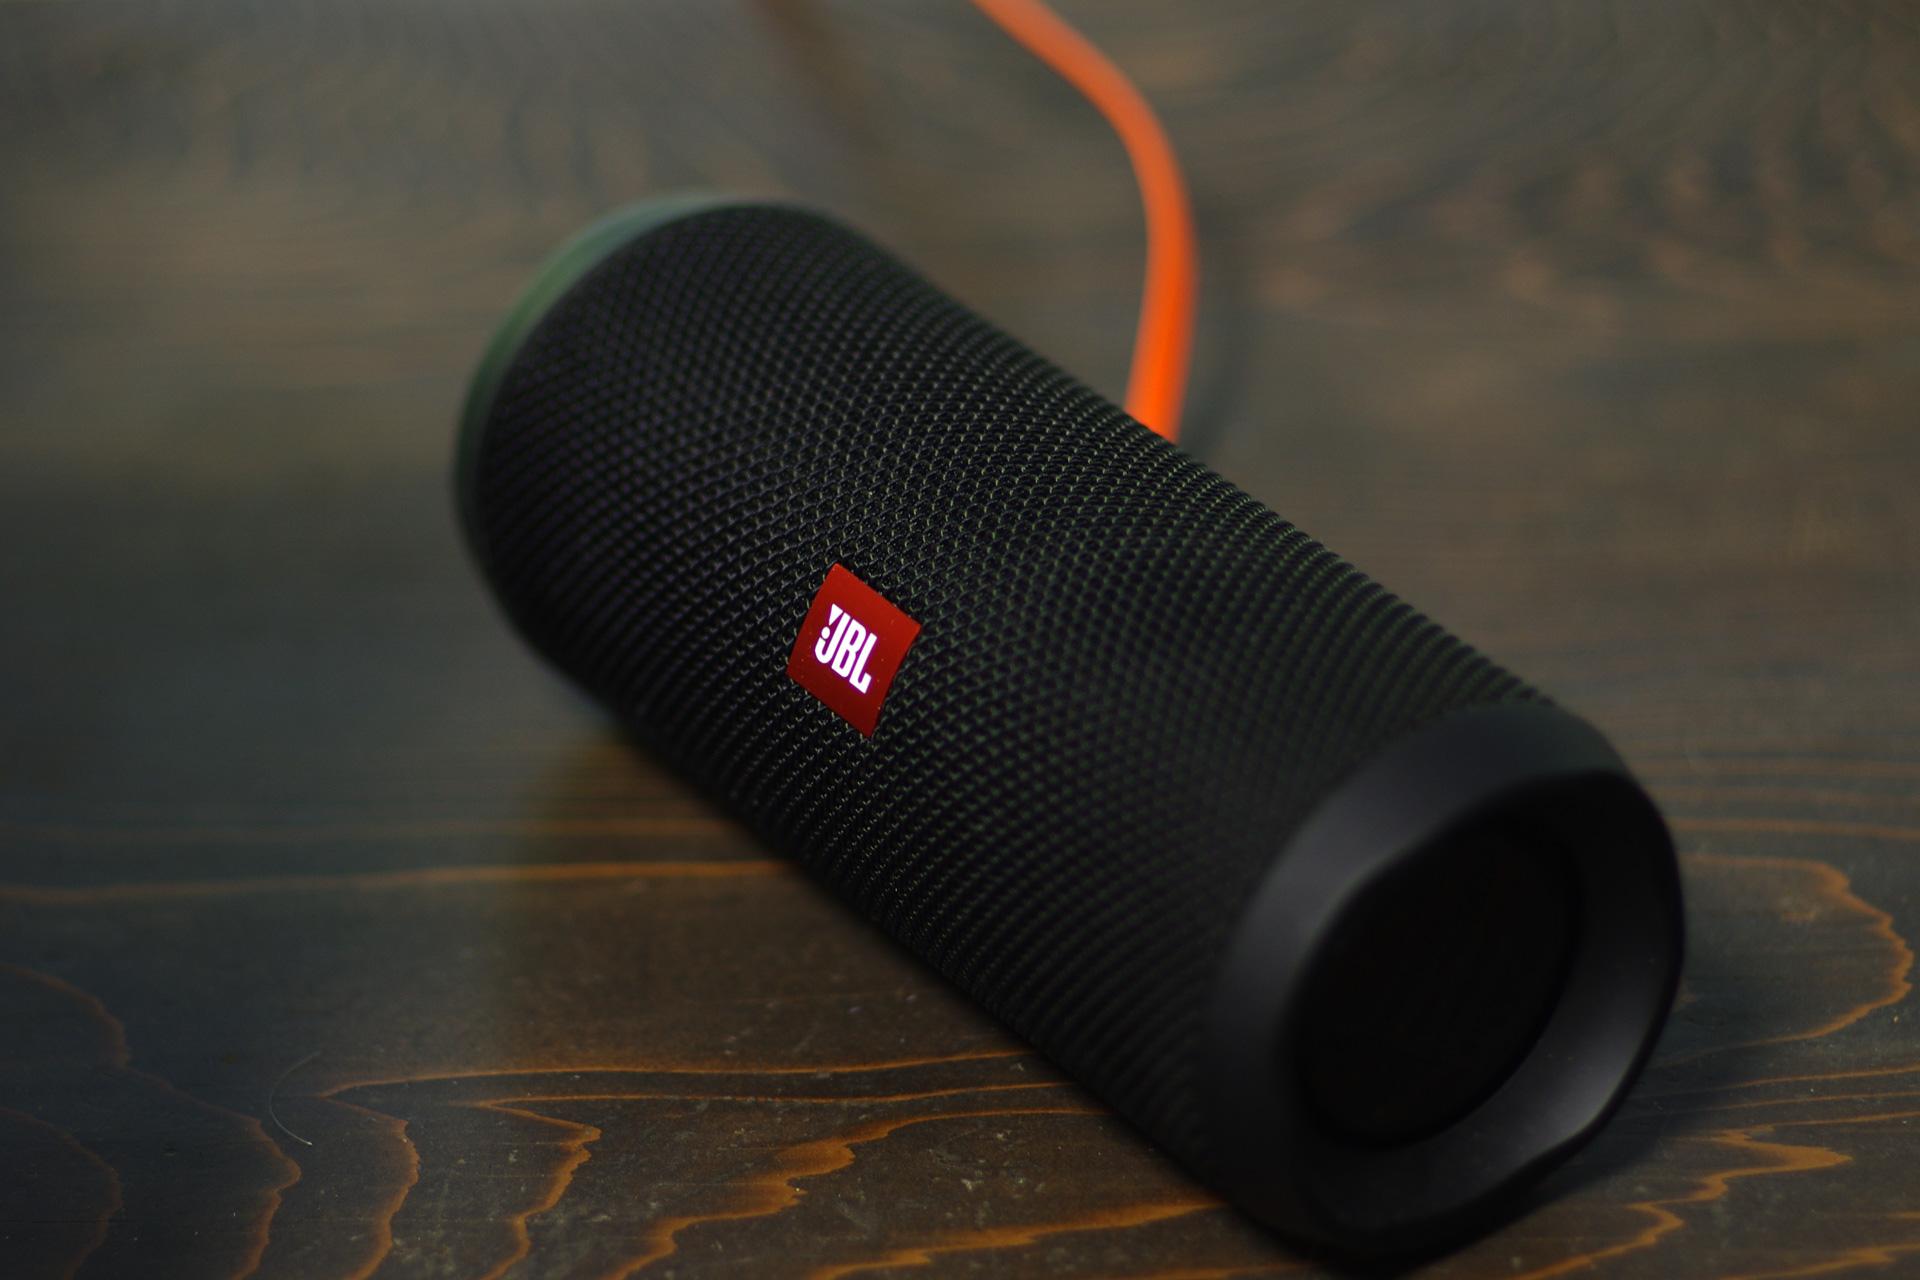 JBL FLIP4(フリップ4) Bluetooth防水コンパクト スピーカー